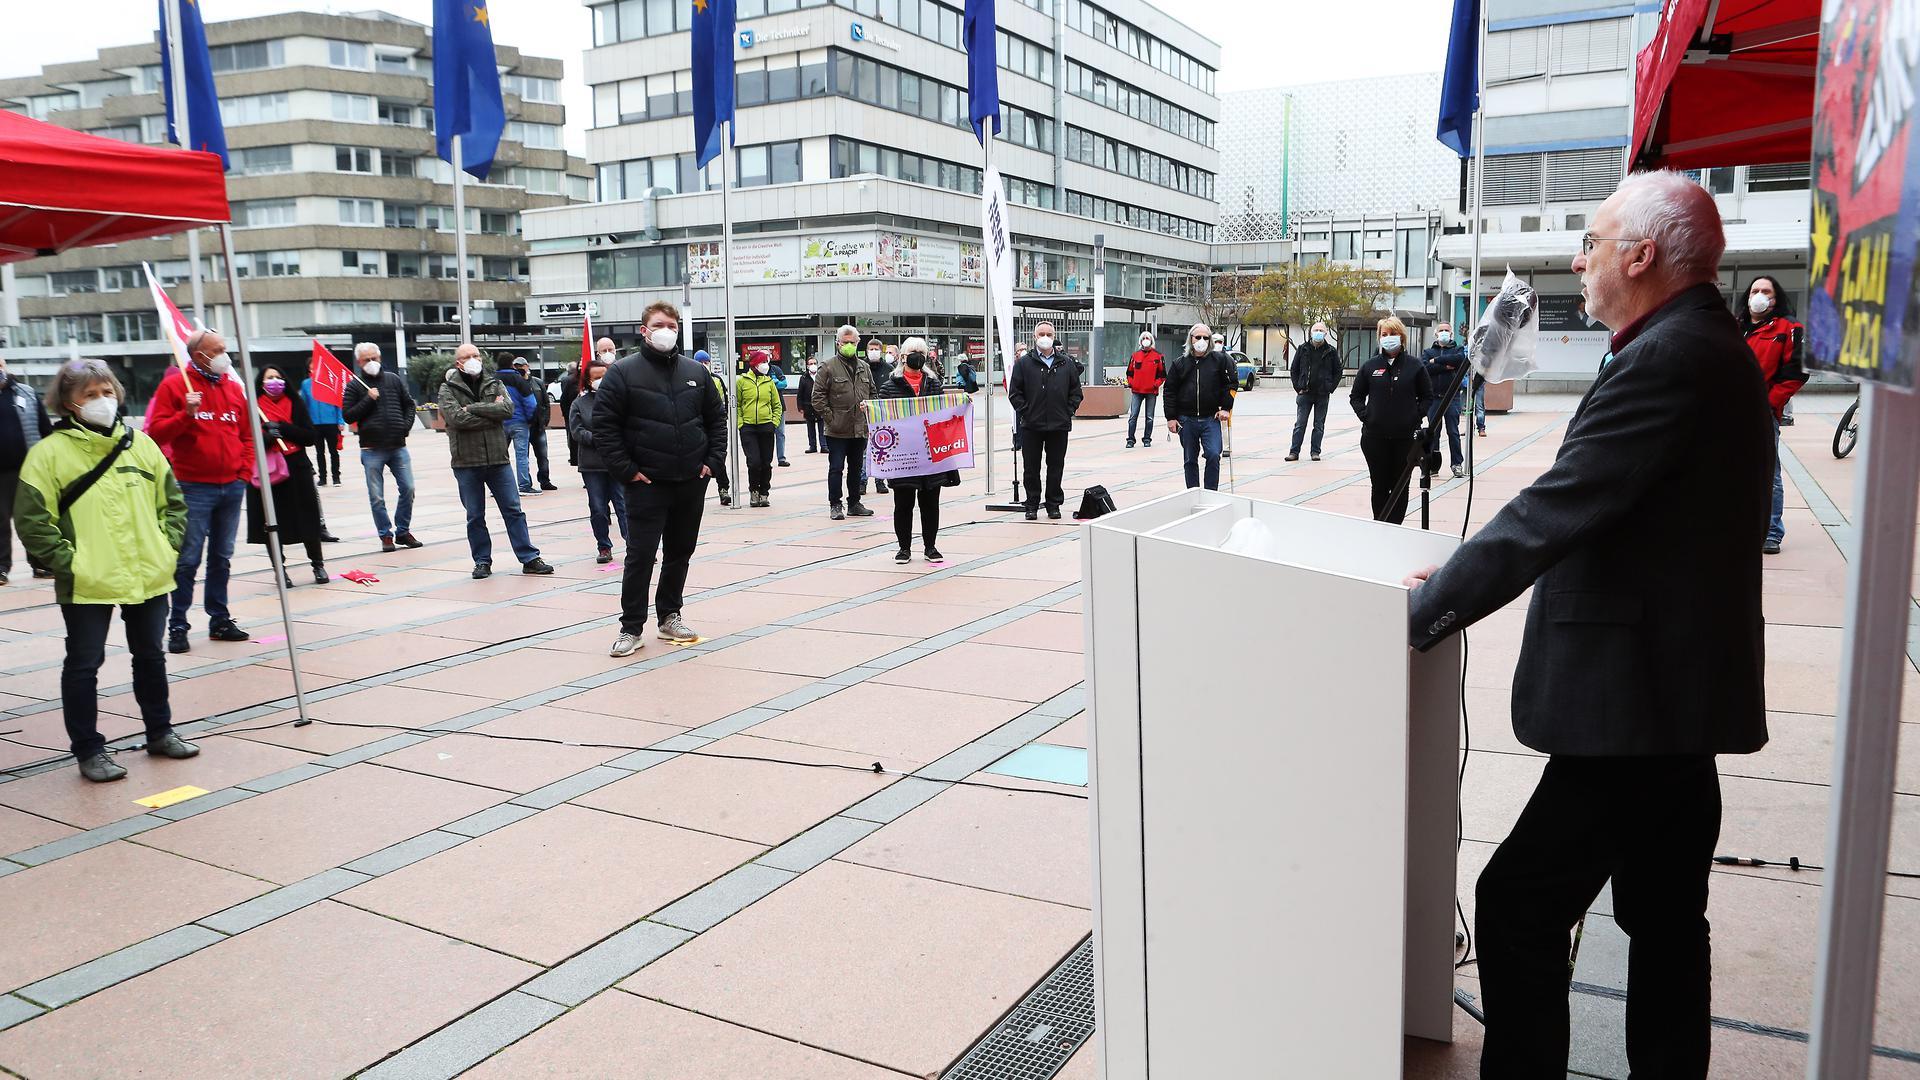 Egger Holger rechts_Hauptredner_Maikundgebung Marktplatz Pforzheim_Engeser Marianne links grün CDU_Herkens Felix Mitte vorne Grüne MdL